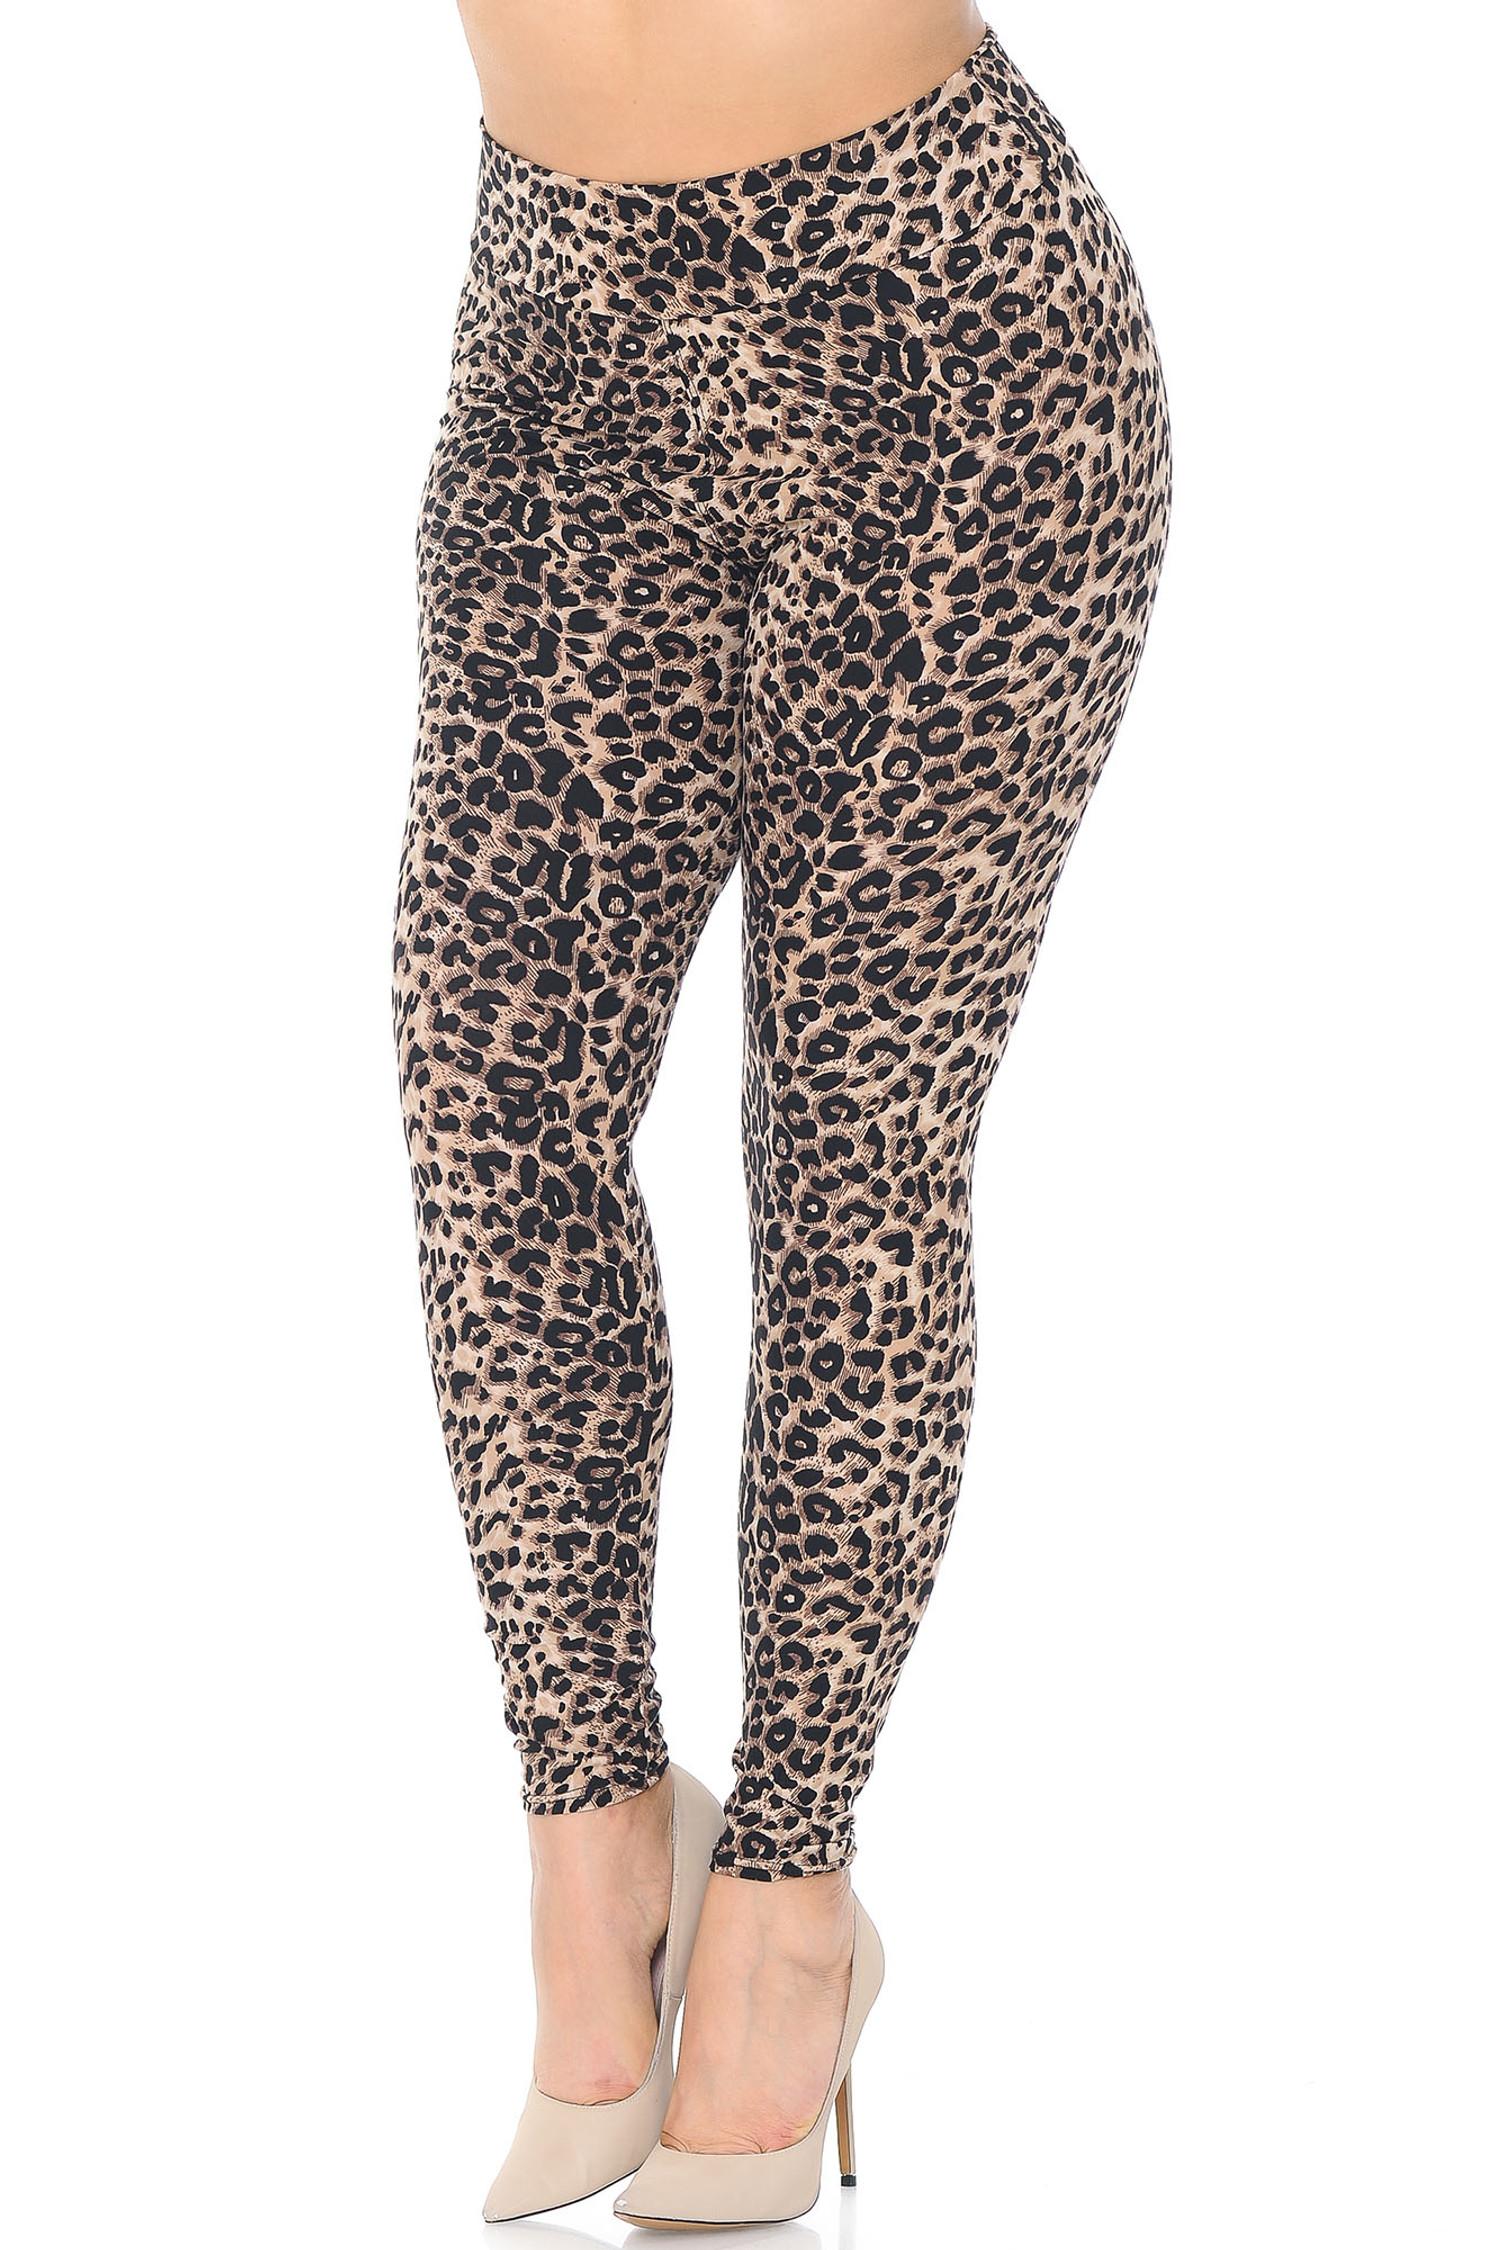 Buttery Soft Feral Cheetah Plus Size High Waisted Leggings